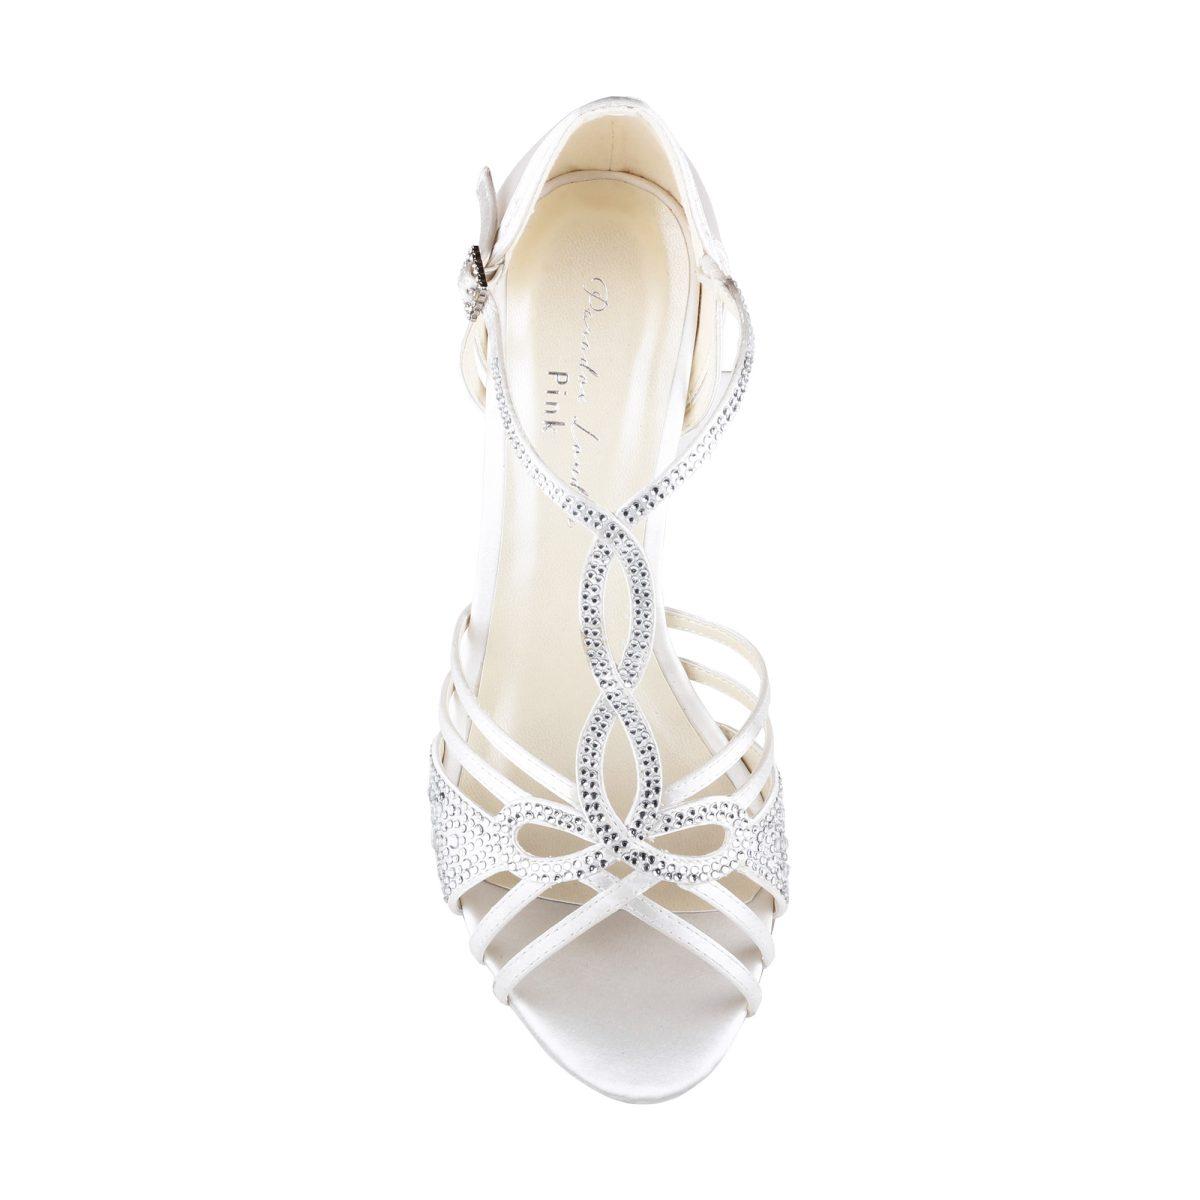 Pink Paradox Larissa - Ivory Satin Bridal Shoes